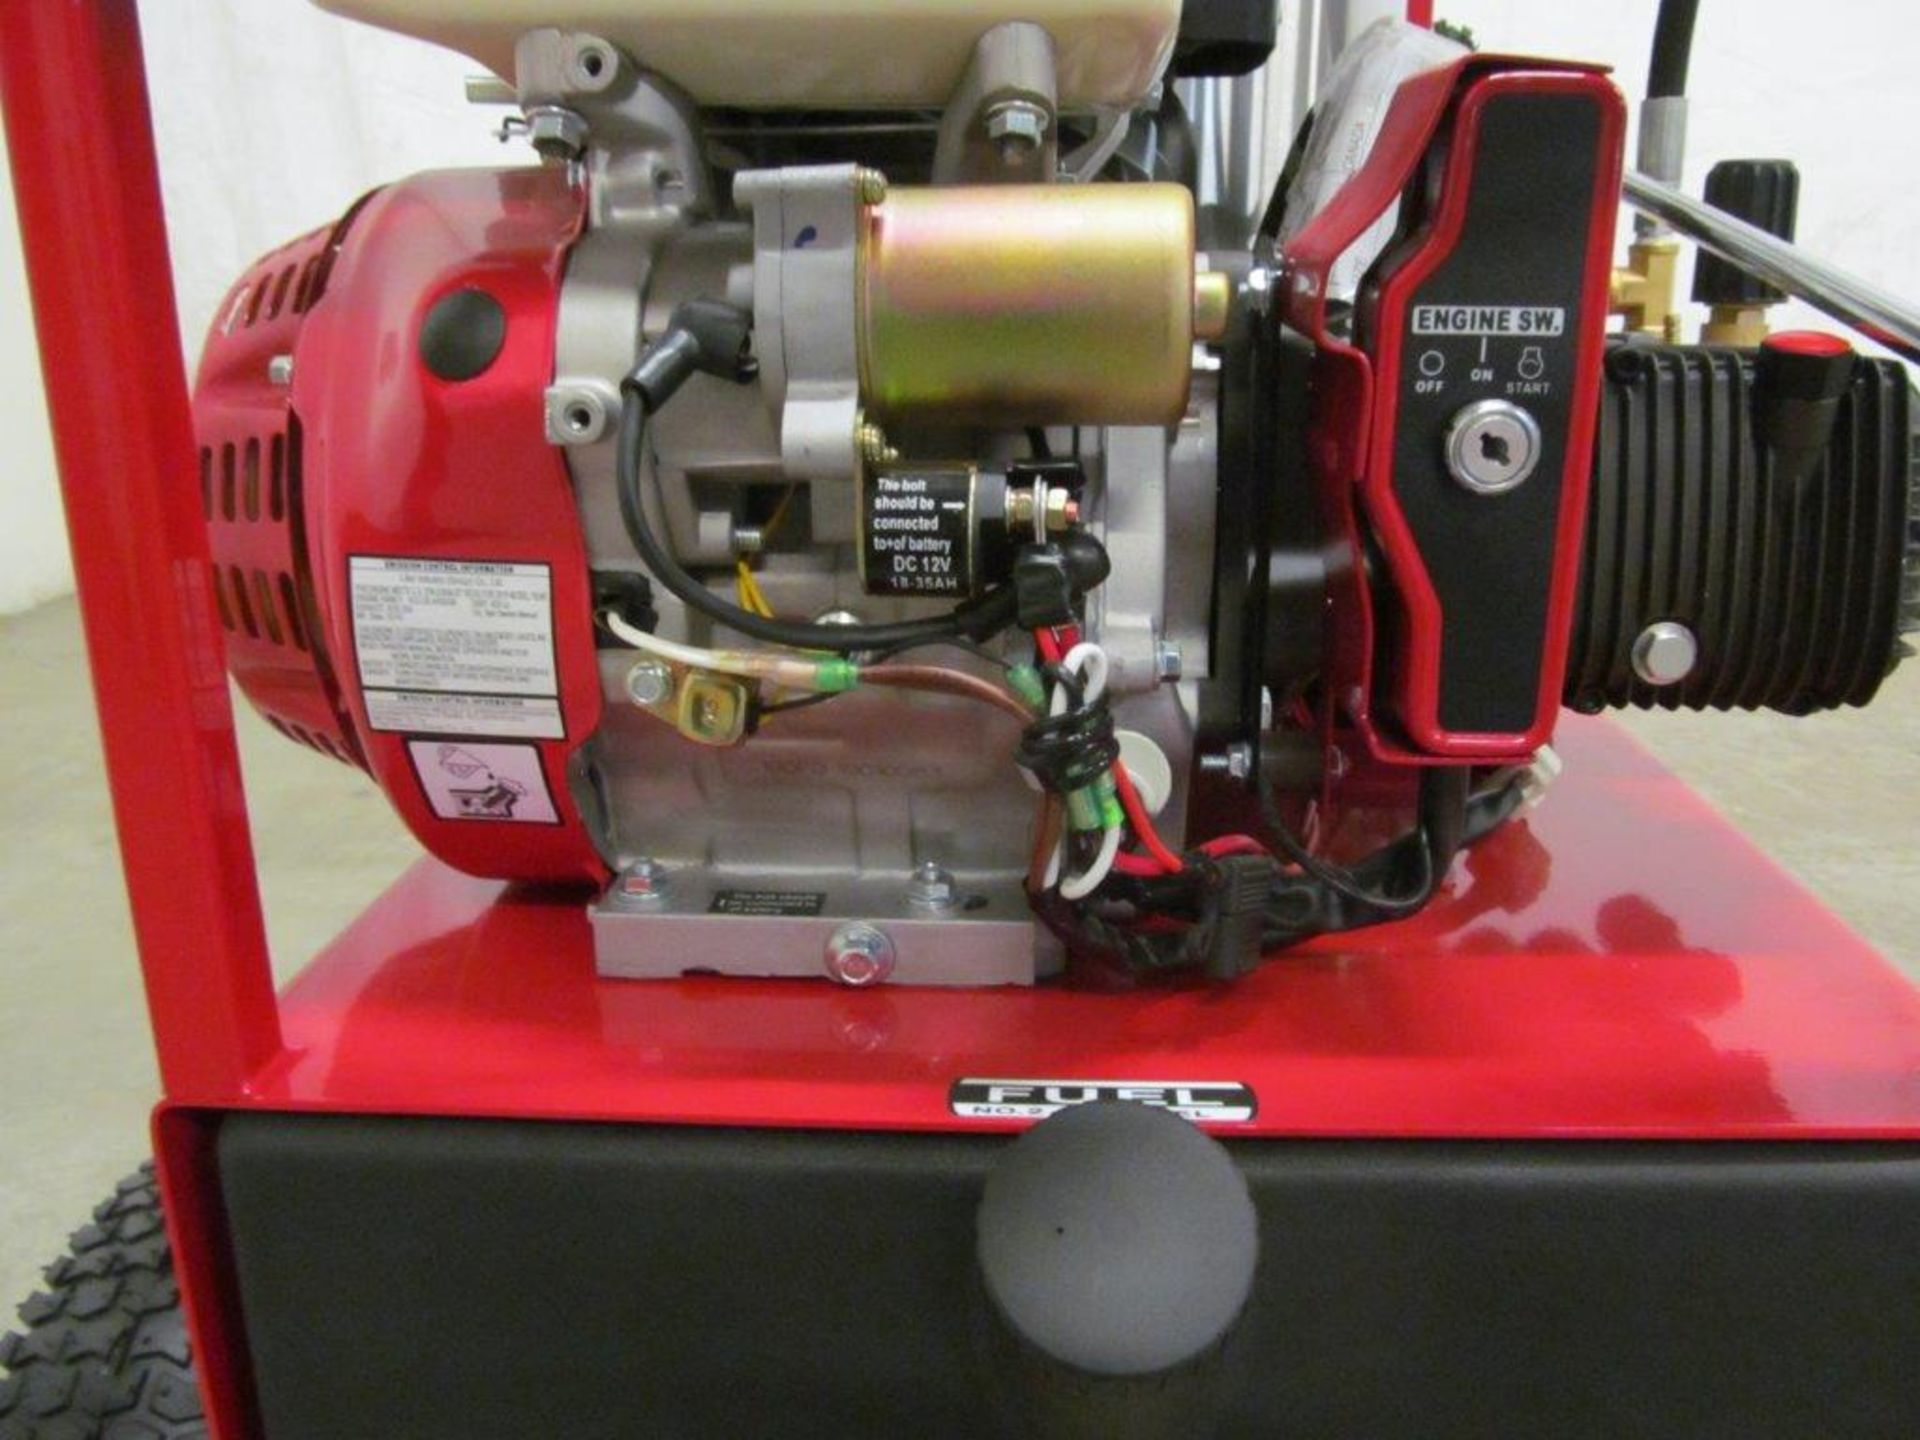 (NEW) EASY-KLEEN HOT WATER PRESSURE WASHER, MDL. MAGNUM GOLD, 15 HP ENGINE. DIESEL FIRED BURNER - Image 11 of 12